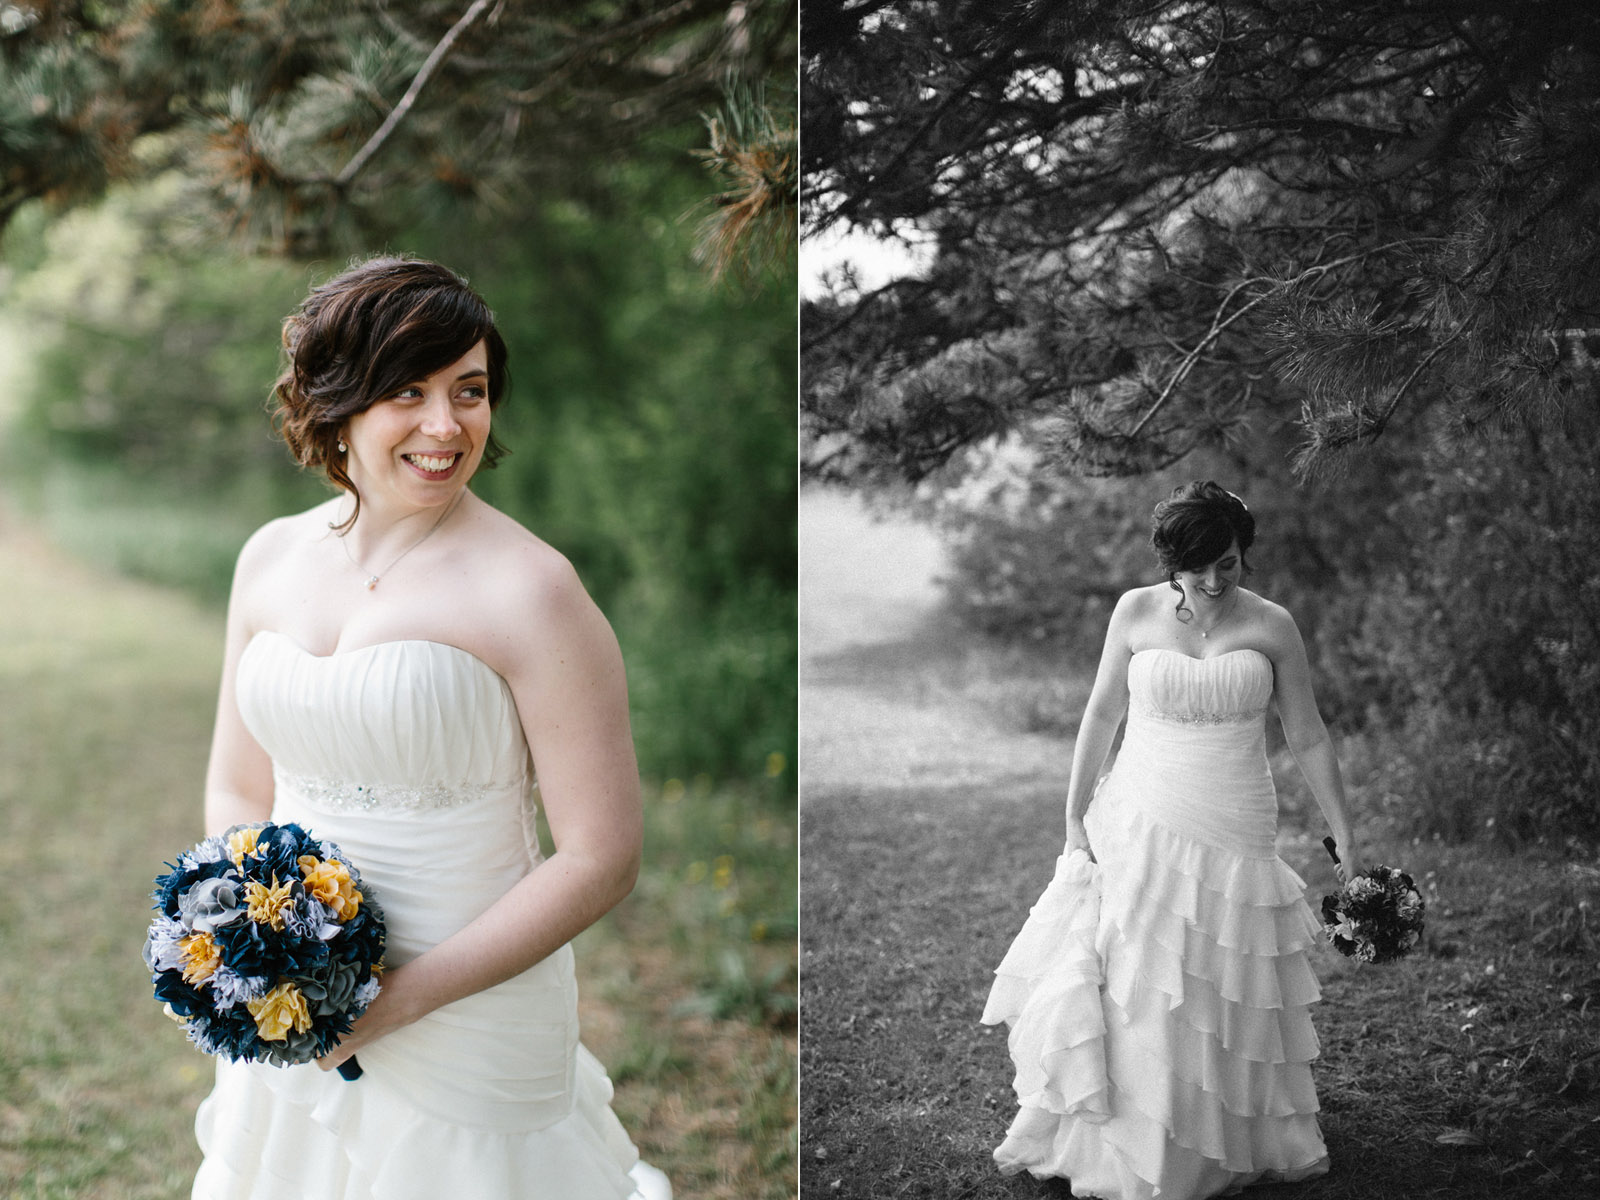 DesMoines_Wedding_Photographer_Spencer&Amanda_048.jpg